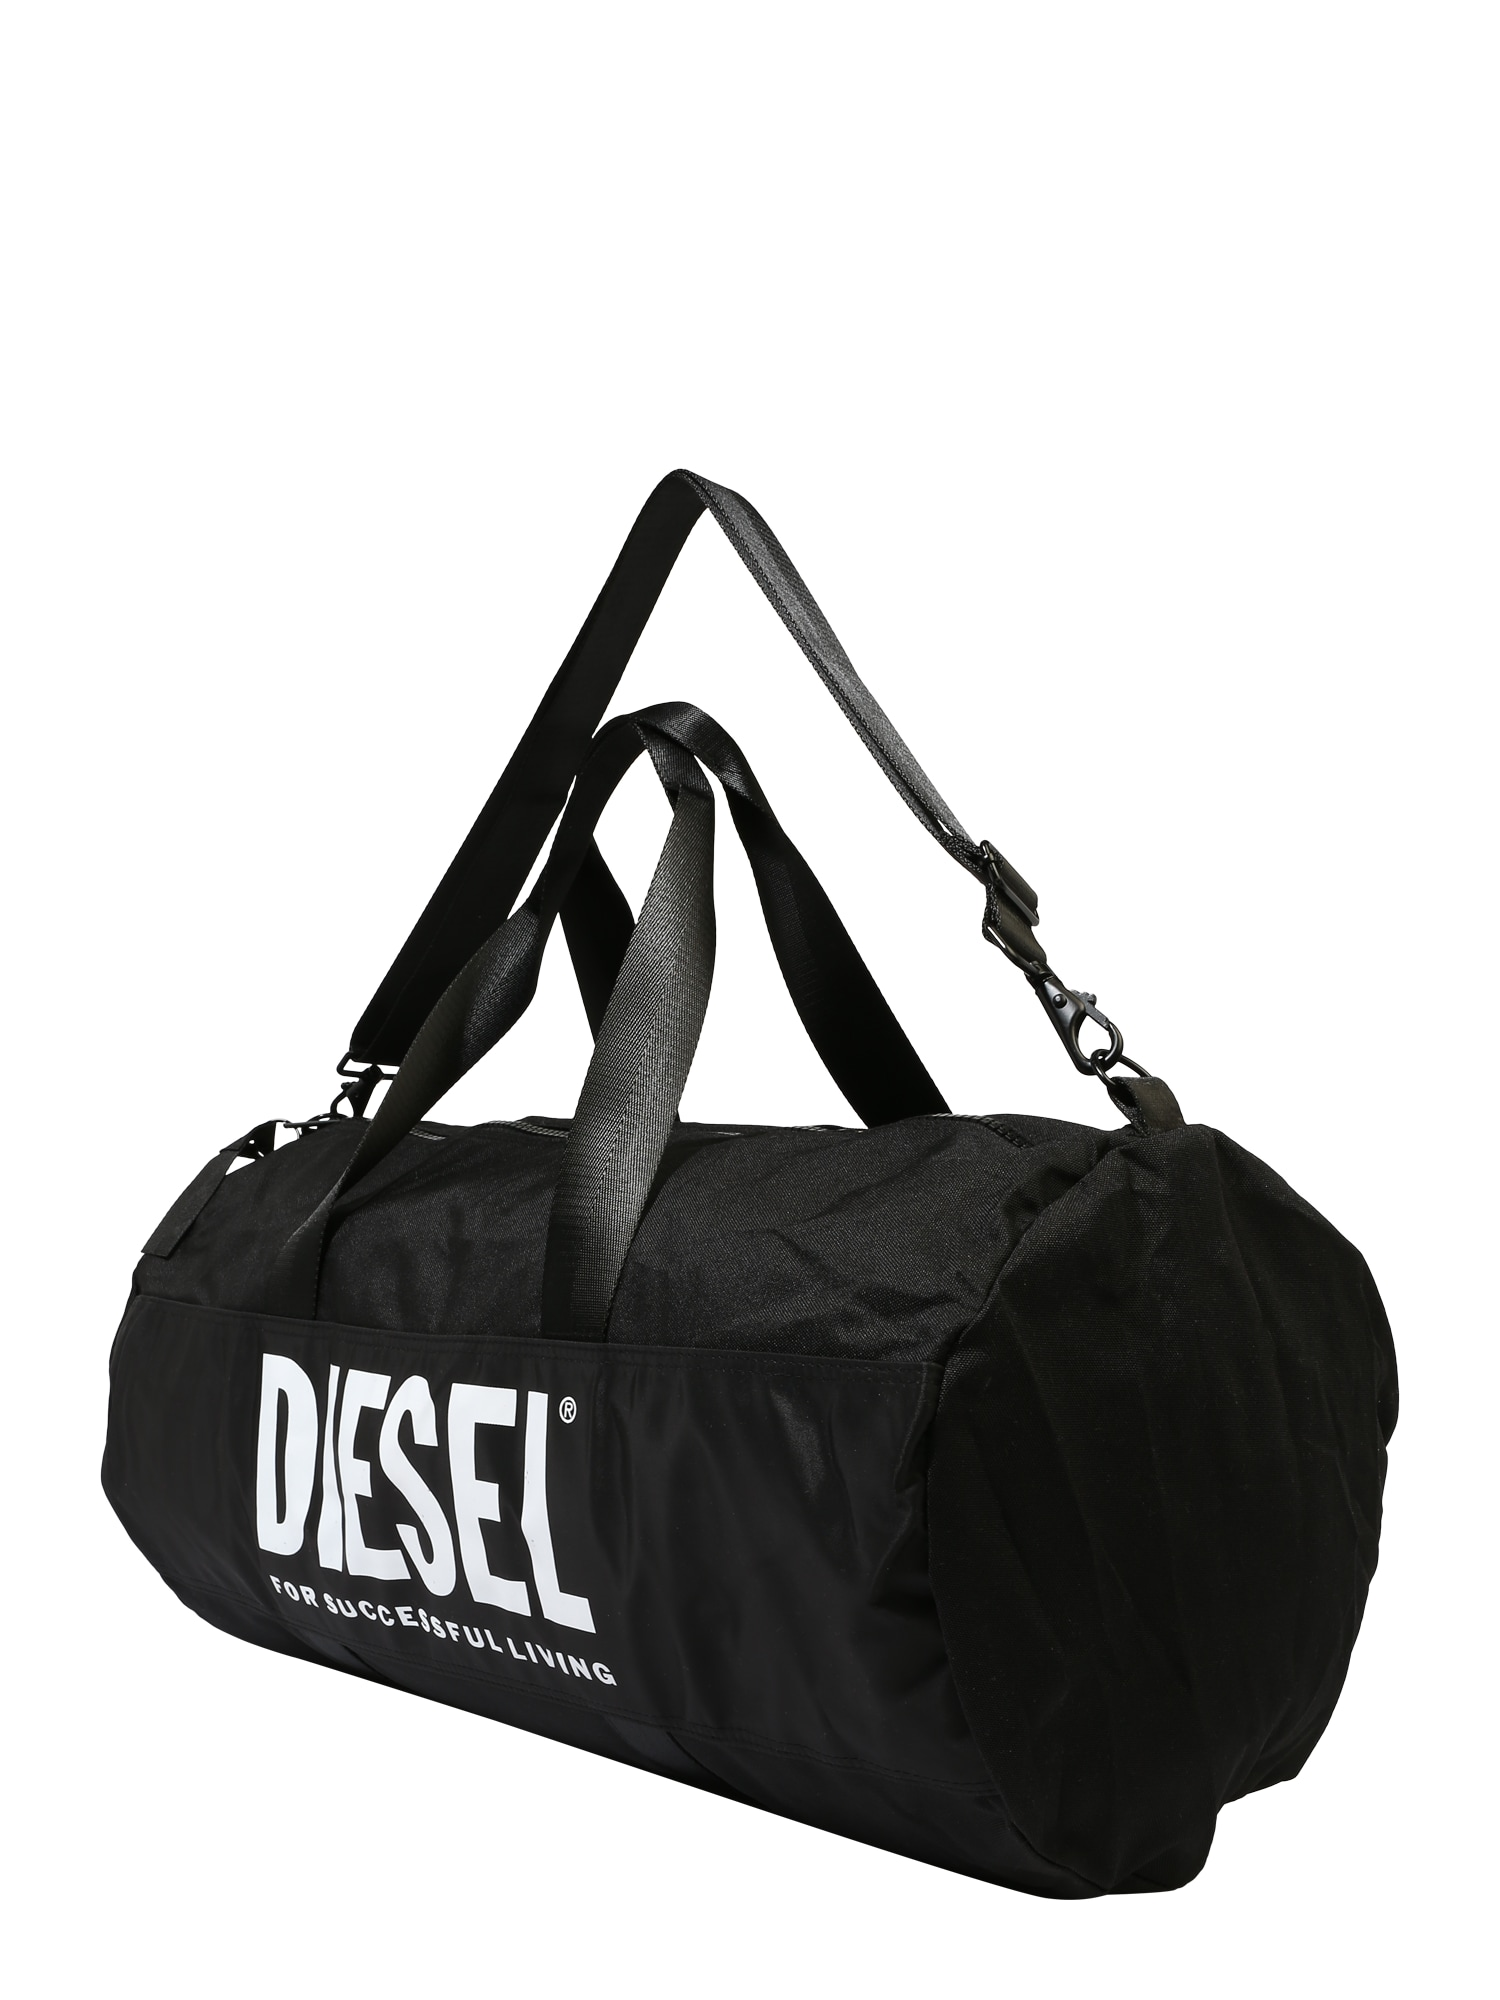 DIESEL Kelioninis krepšys 'UFFLE PROPS' juoda